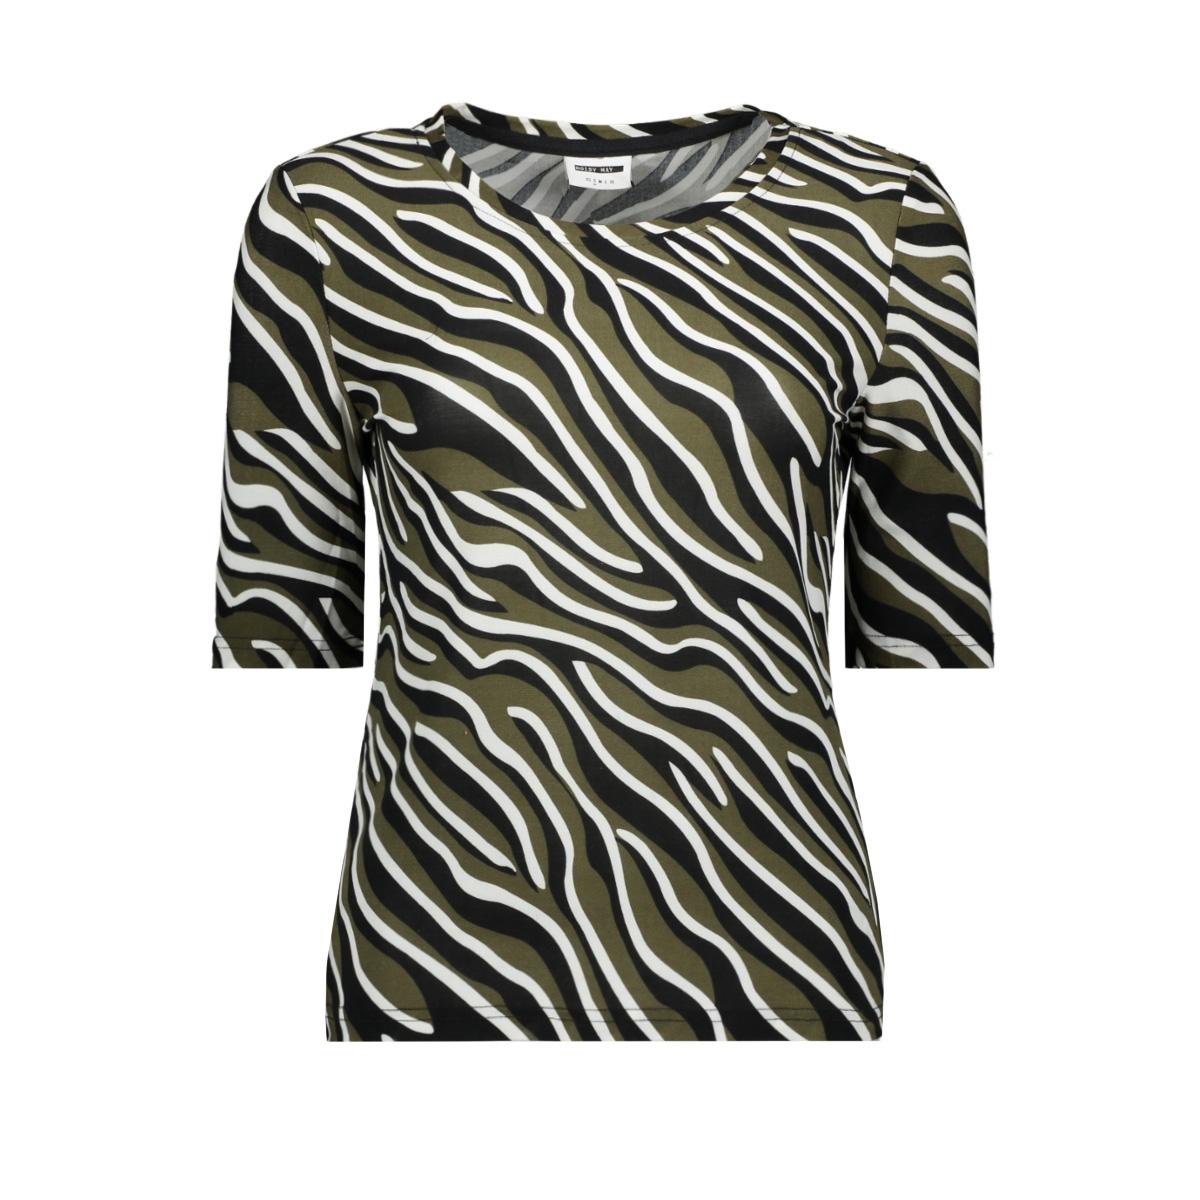 nmsally 2/4 sleeve top aop 27012318 noisy may t-shirt olive night/zebra black